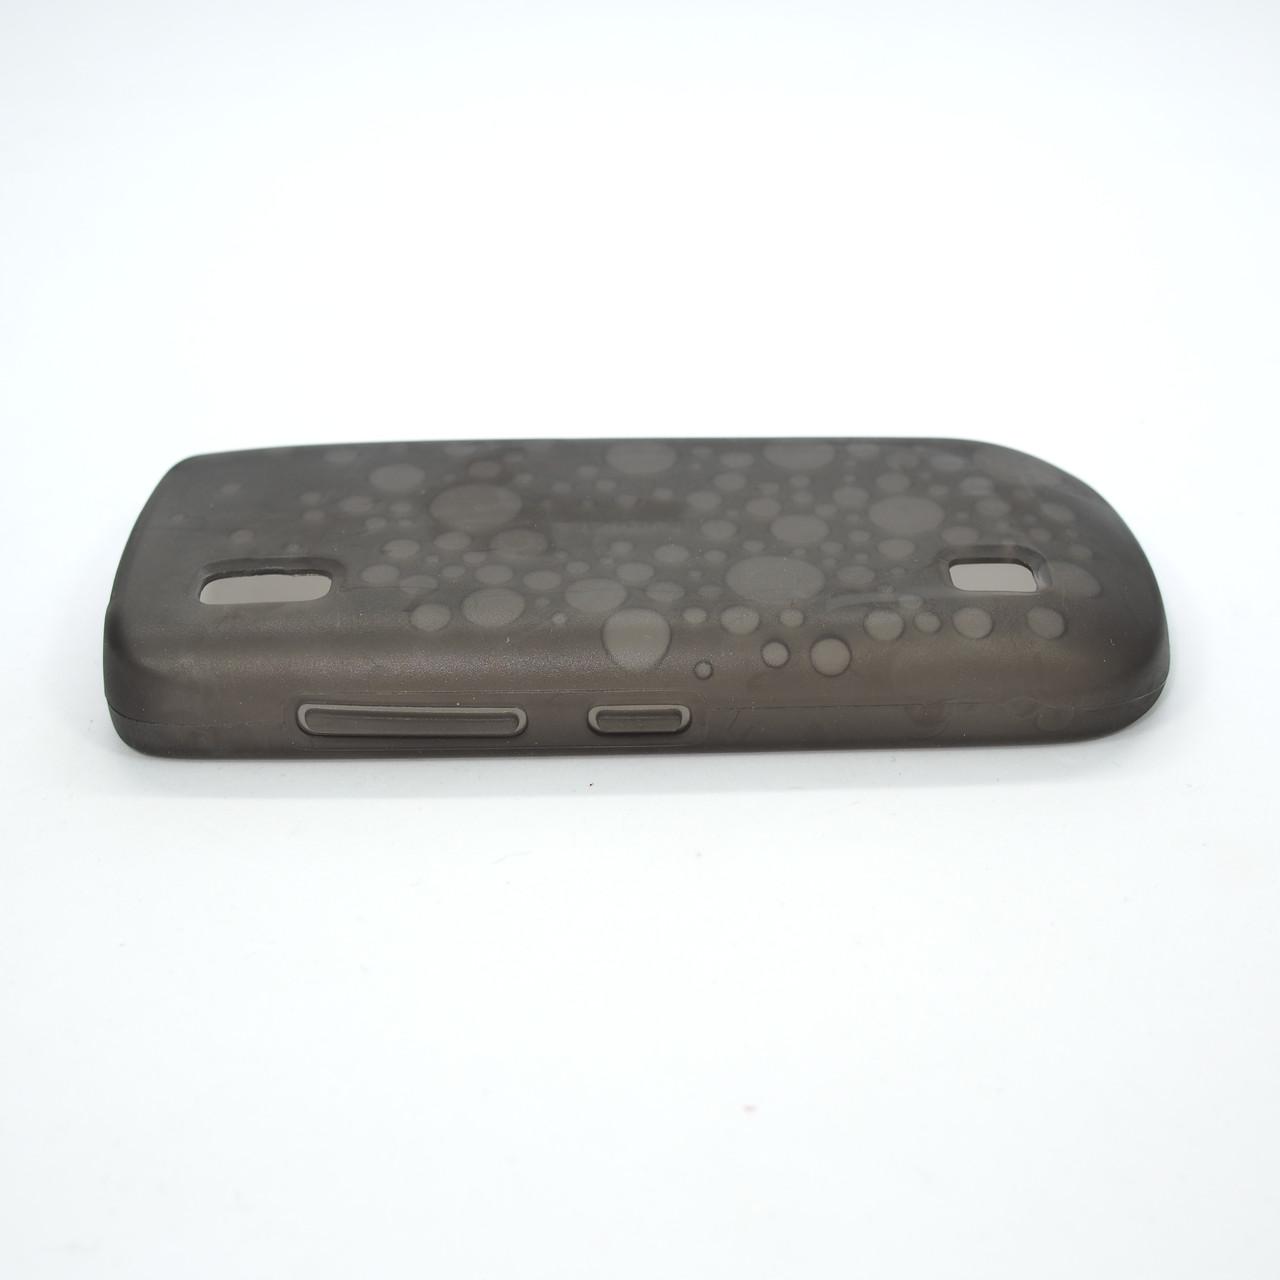 Чехлы для Nokia CC-1035 300 Silicone Cover black Для телефона